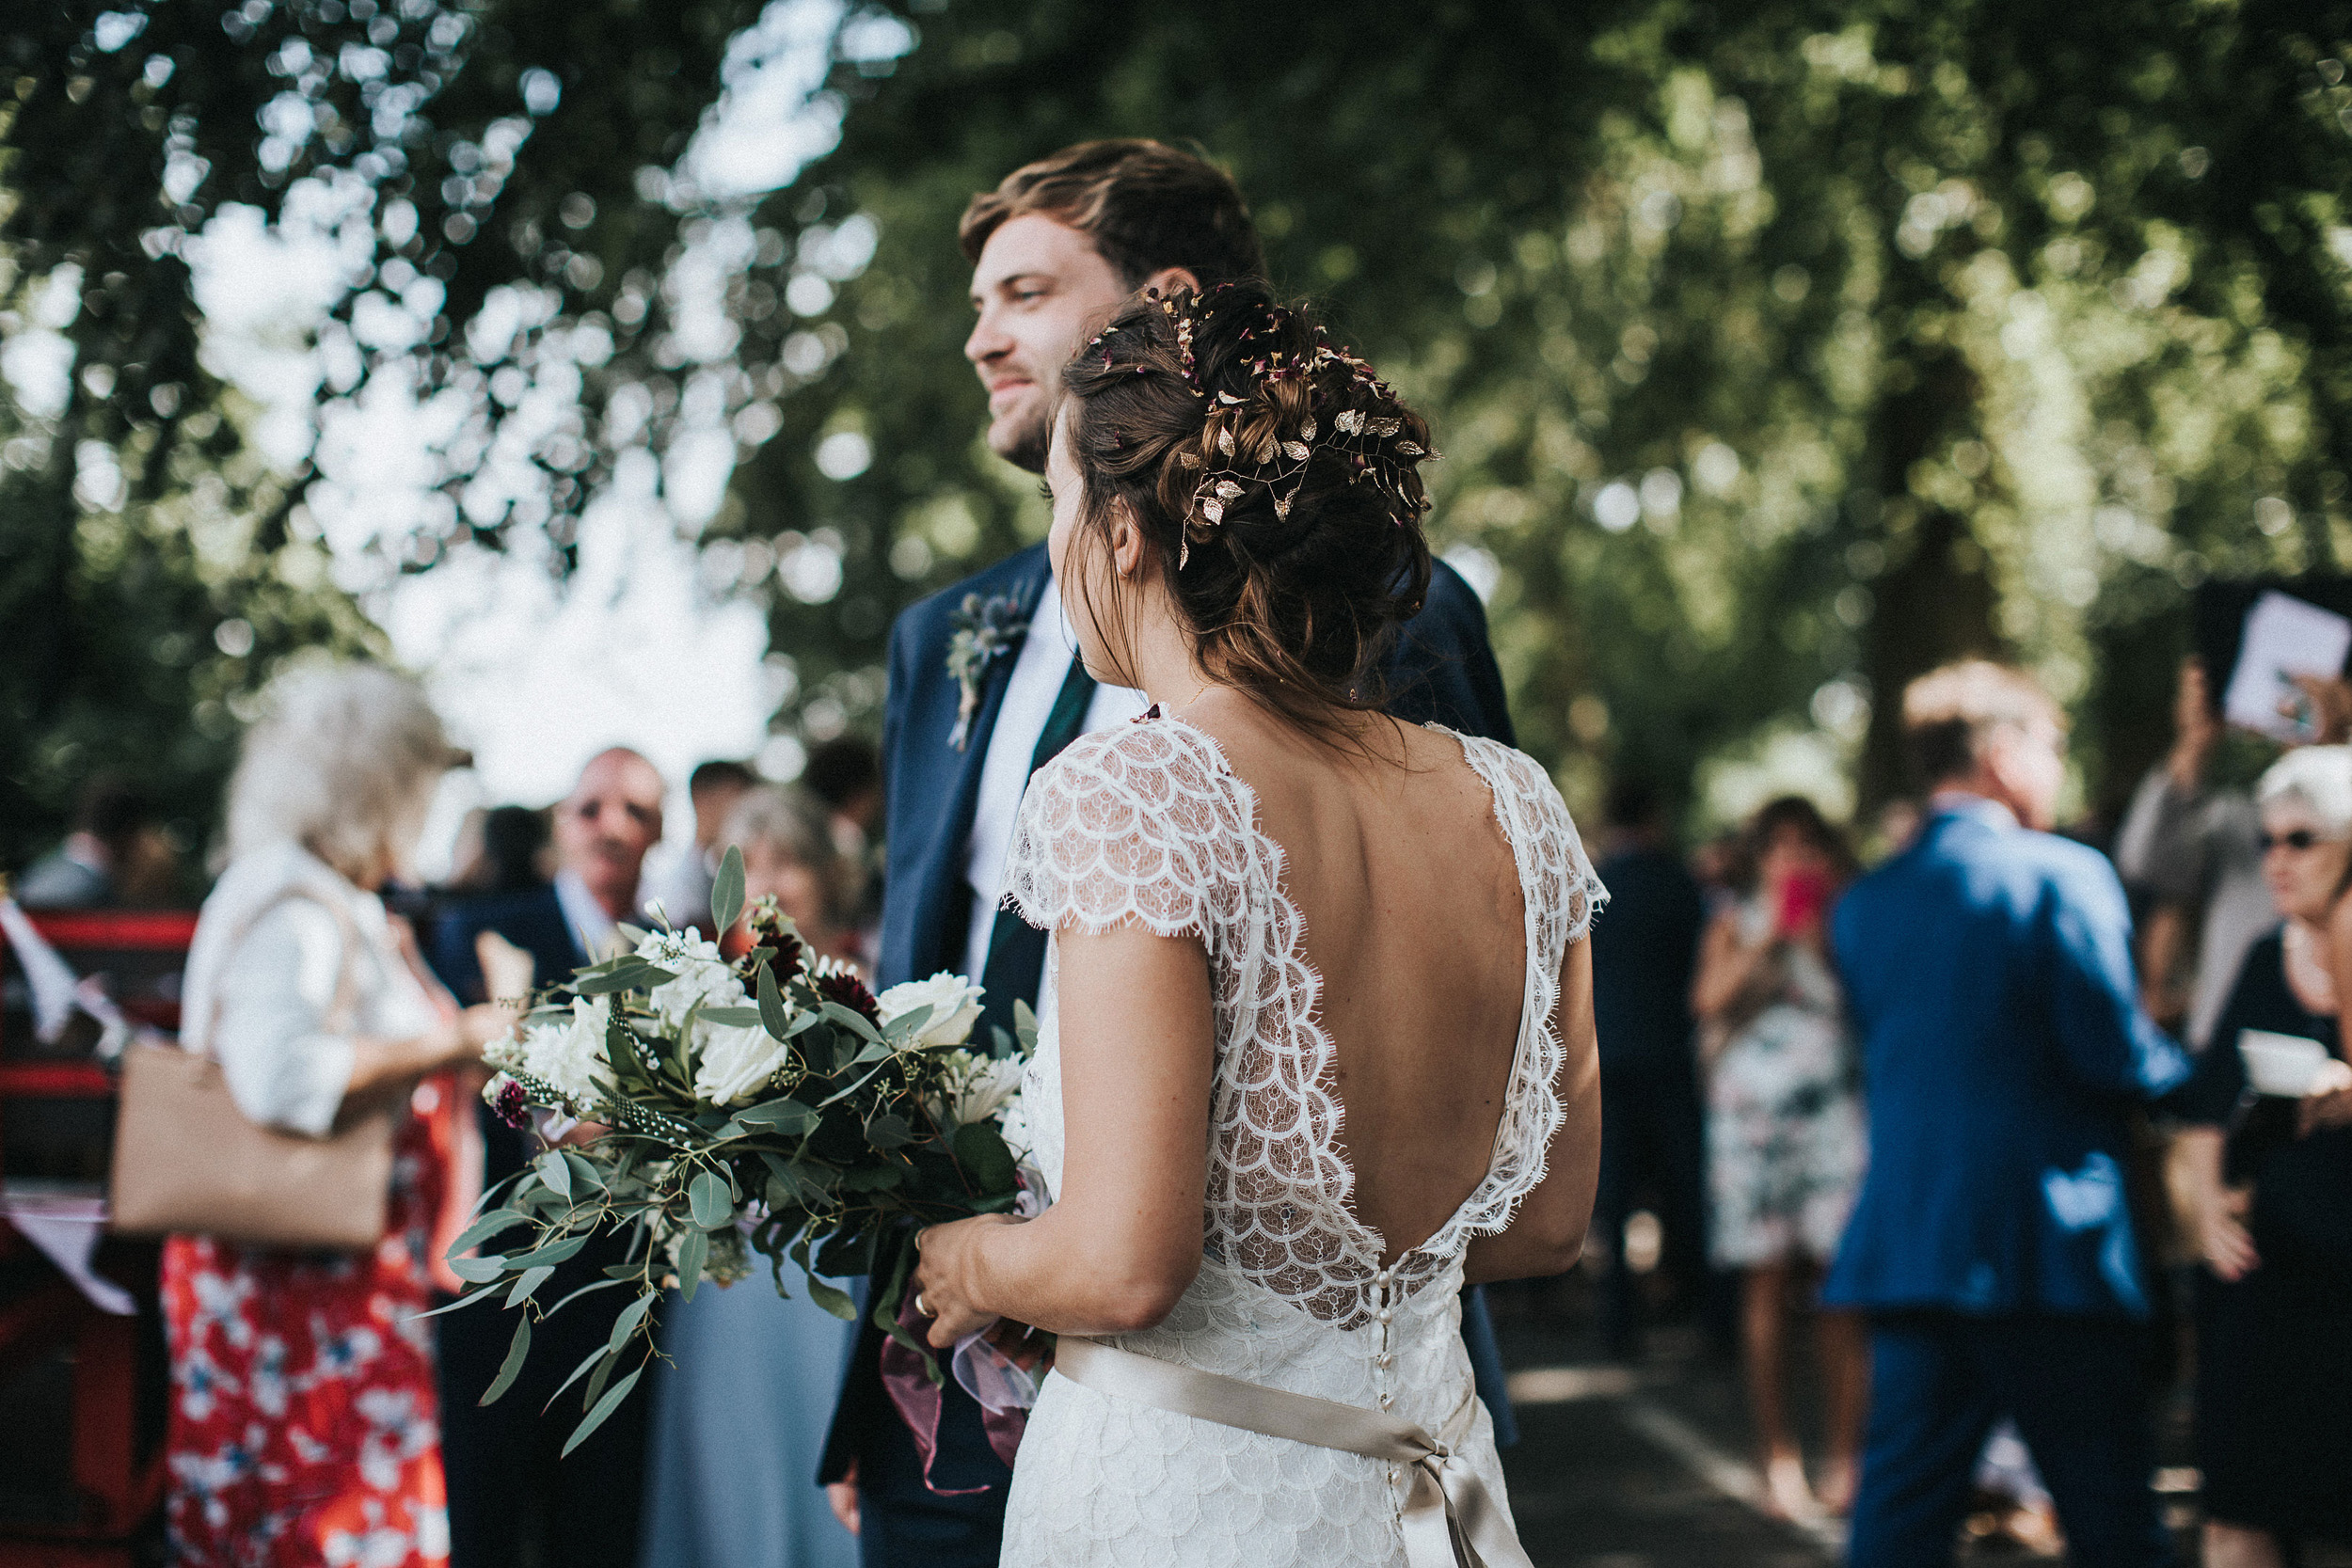 Martha-Laid-Back-Garden-Wedding-Lace-Wedding-Dress-Bohemian-Kate-Beaumont-27.jpg